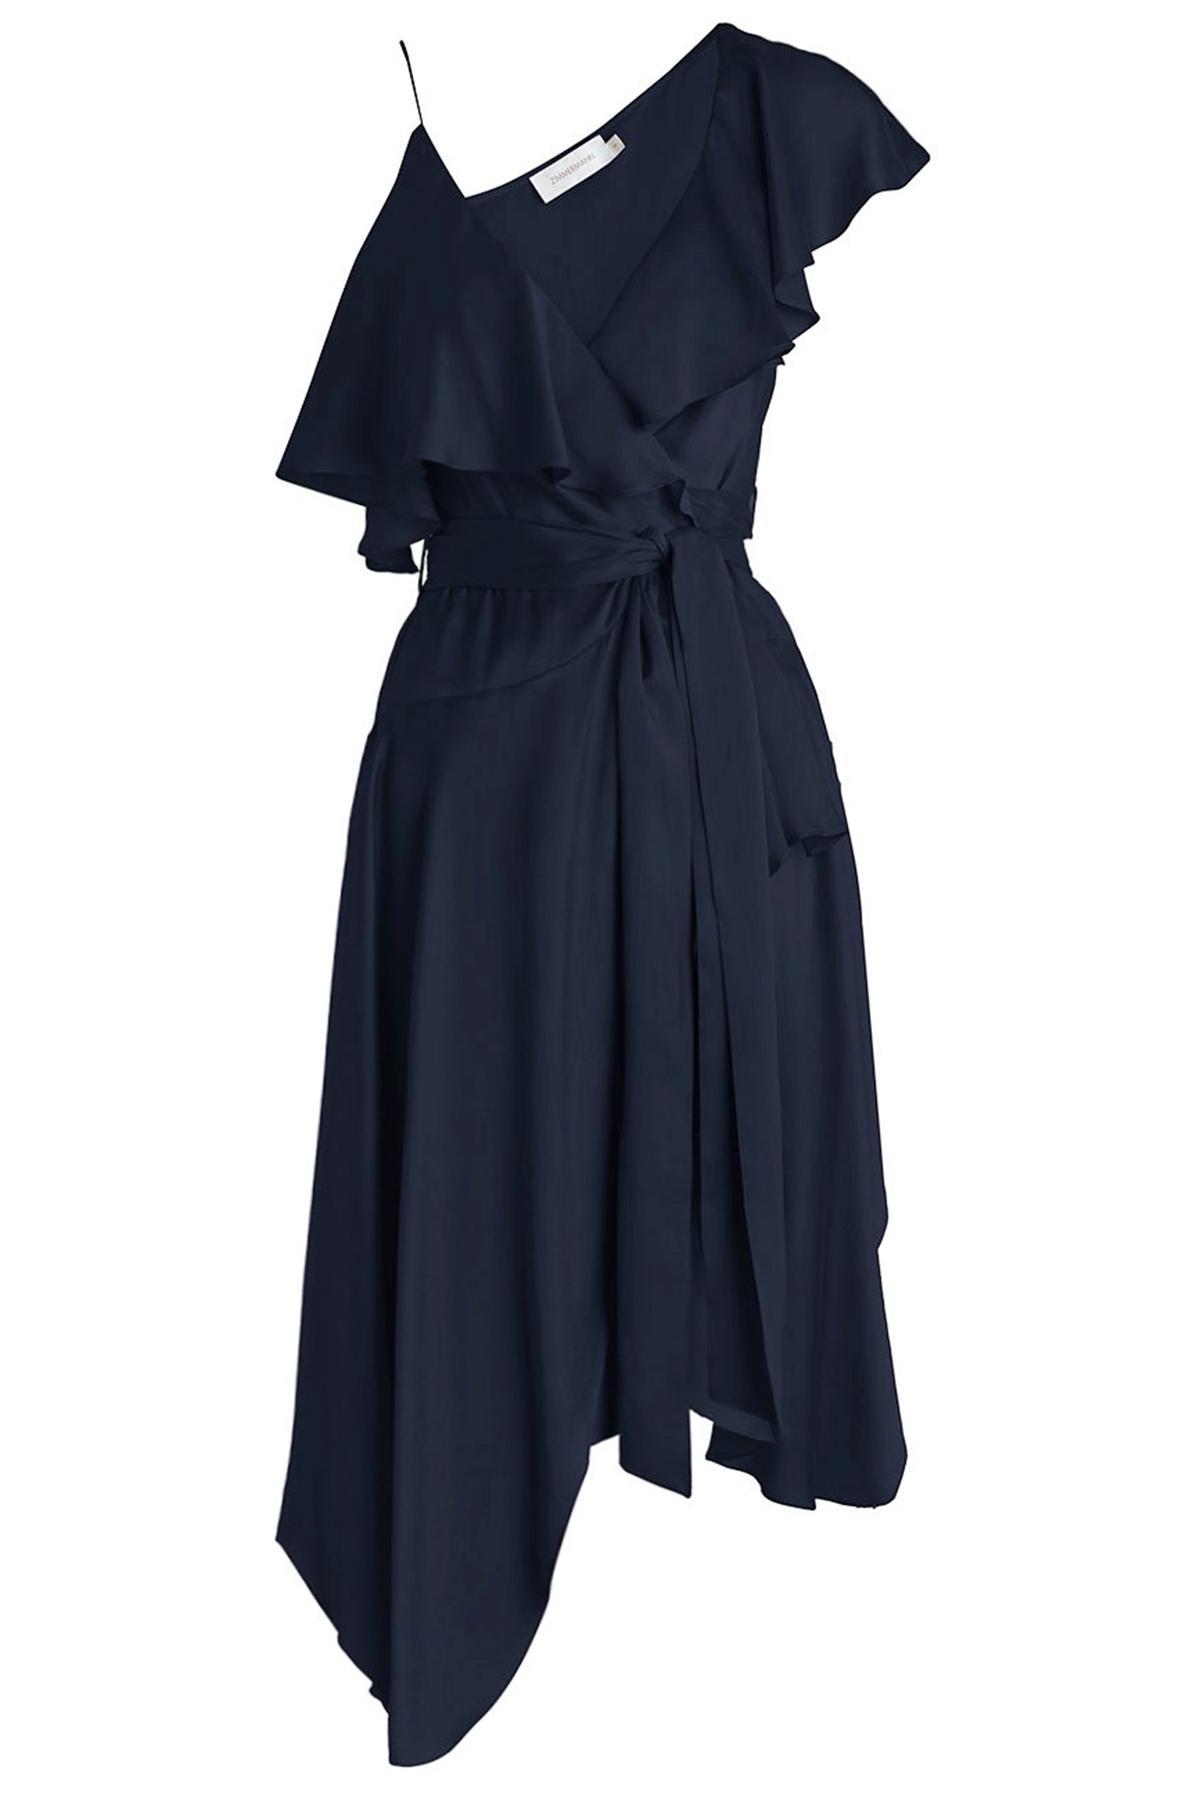 Zimmermann Sueded Asymmetric Wrap Dress In French Navy In